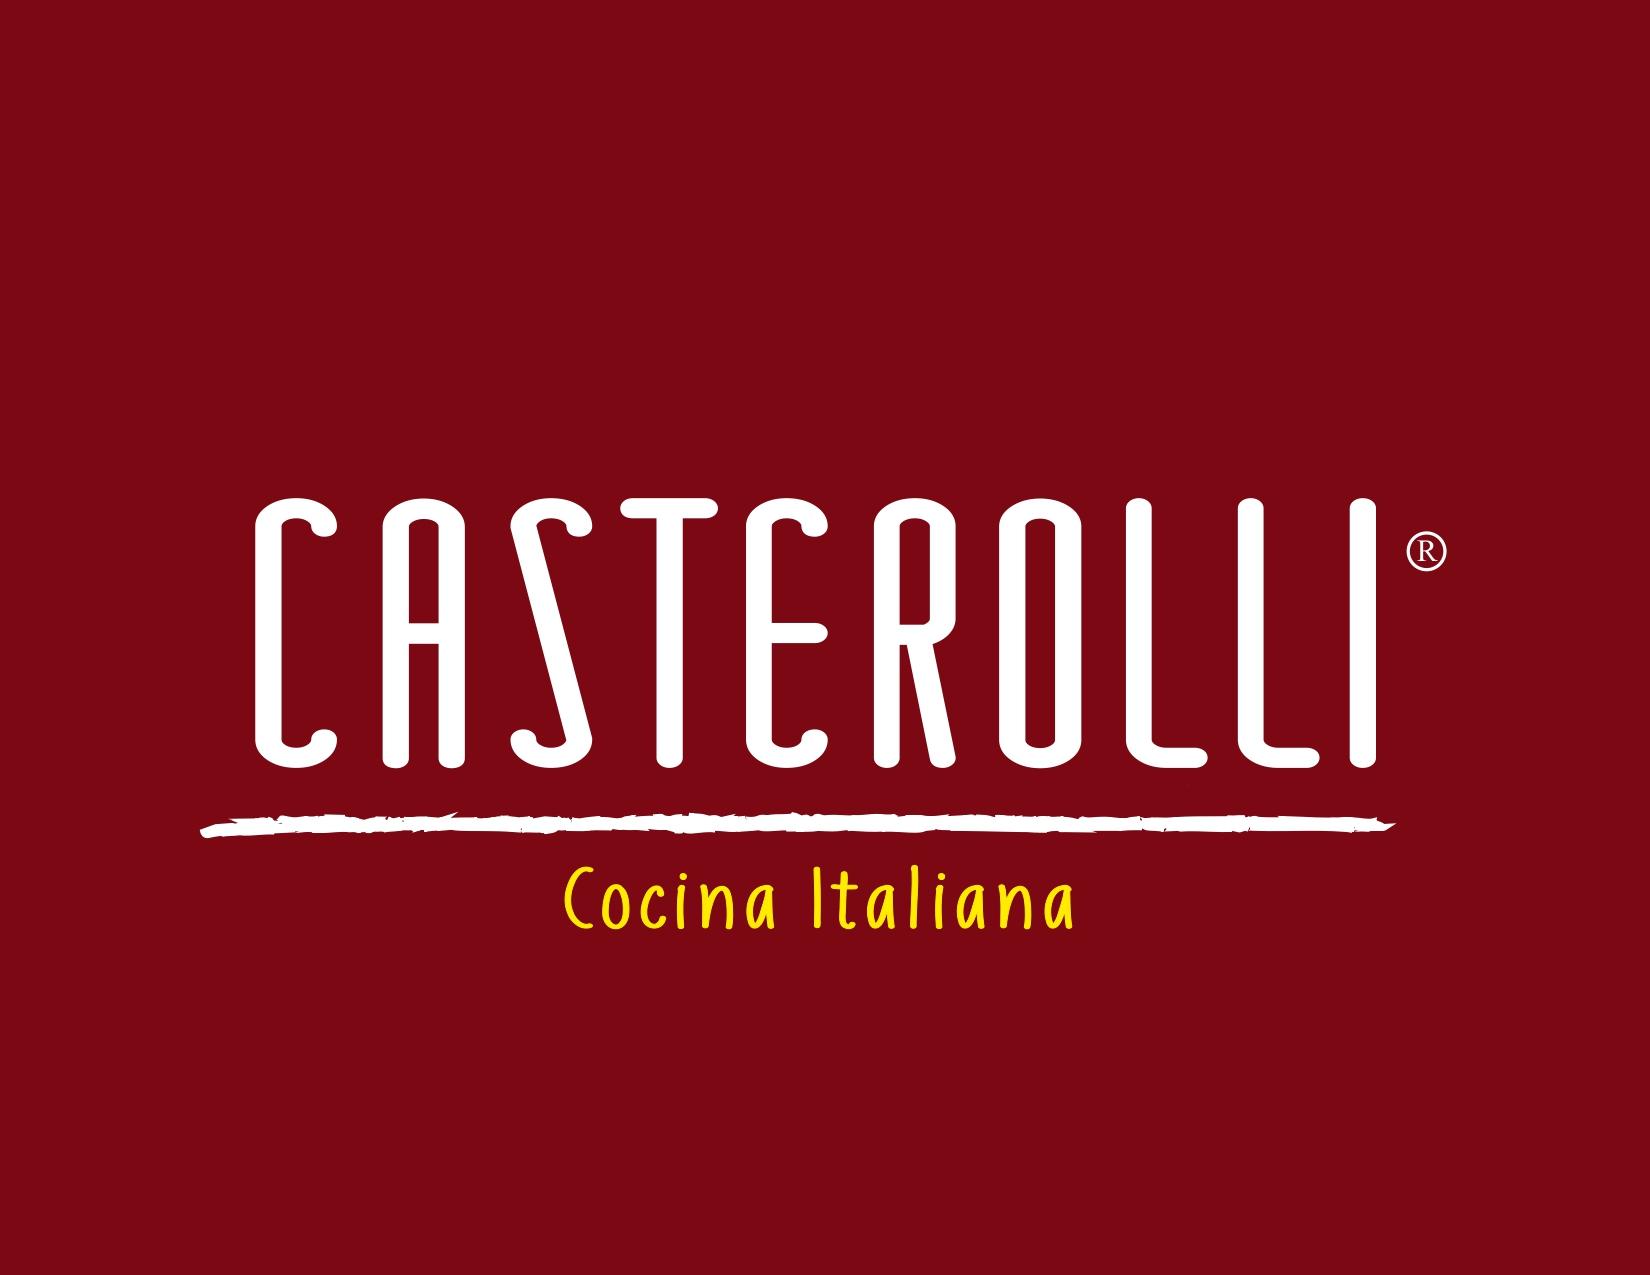 Casterolli Cocina Italiana - Techo